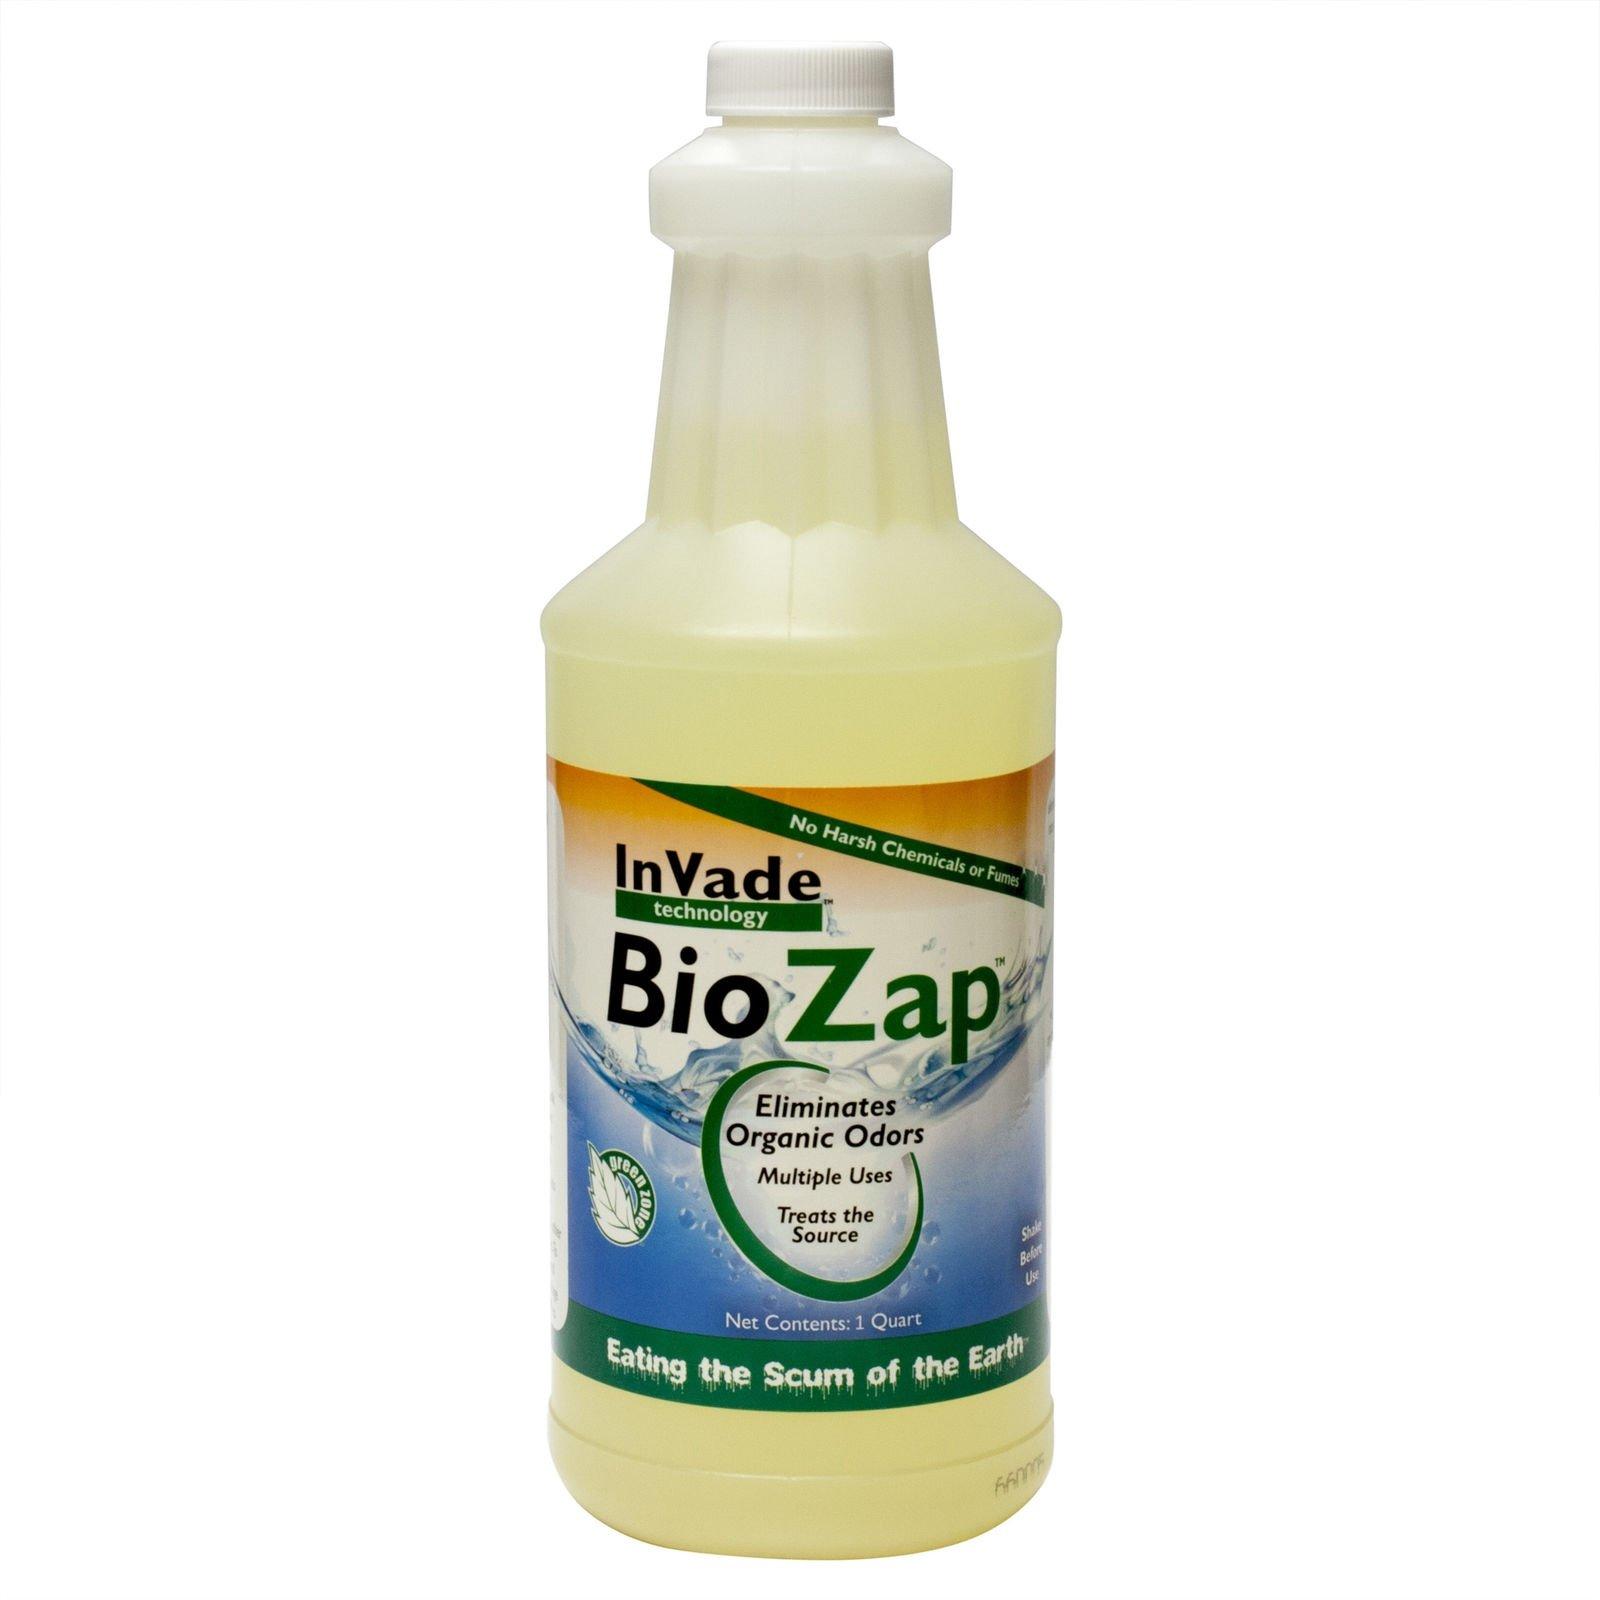 InVade Bio Zap Odor Eliminator -QT